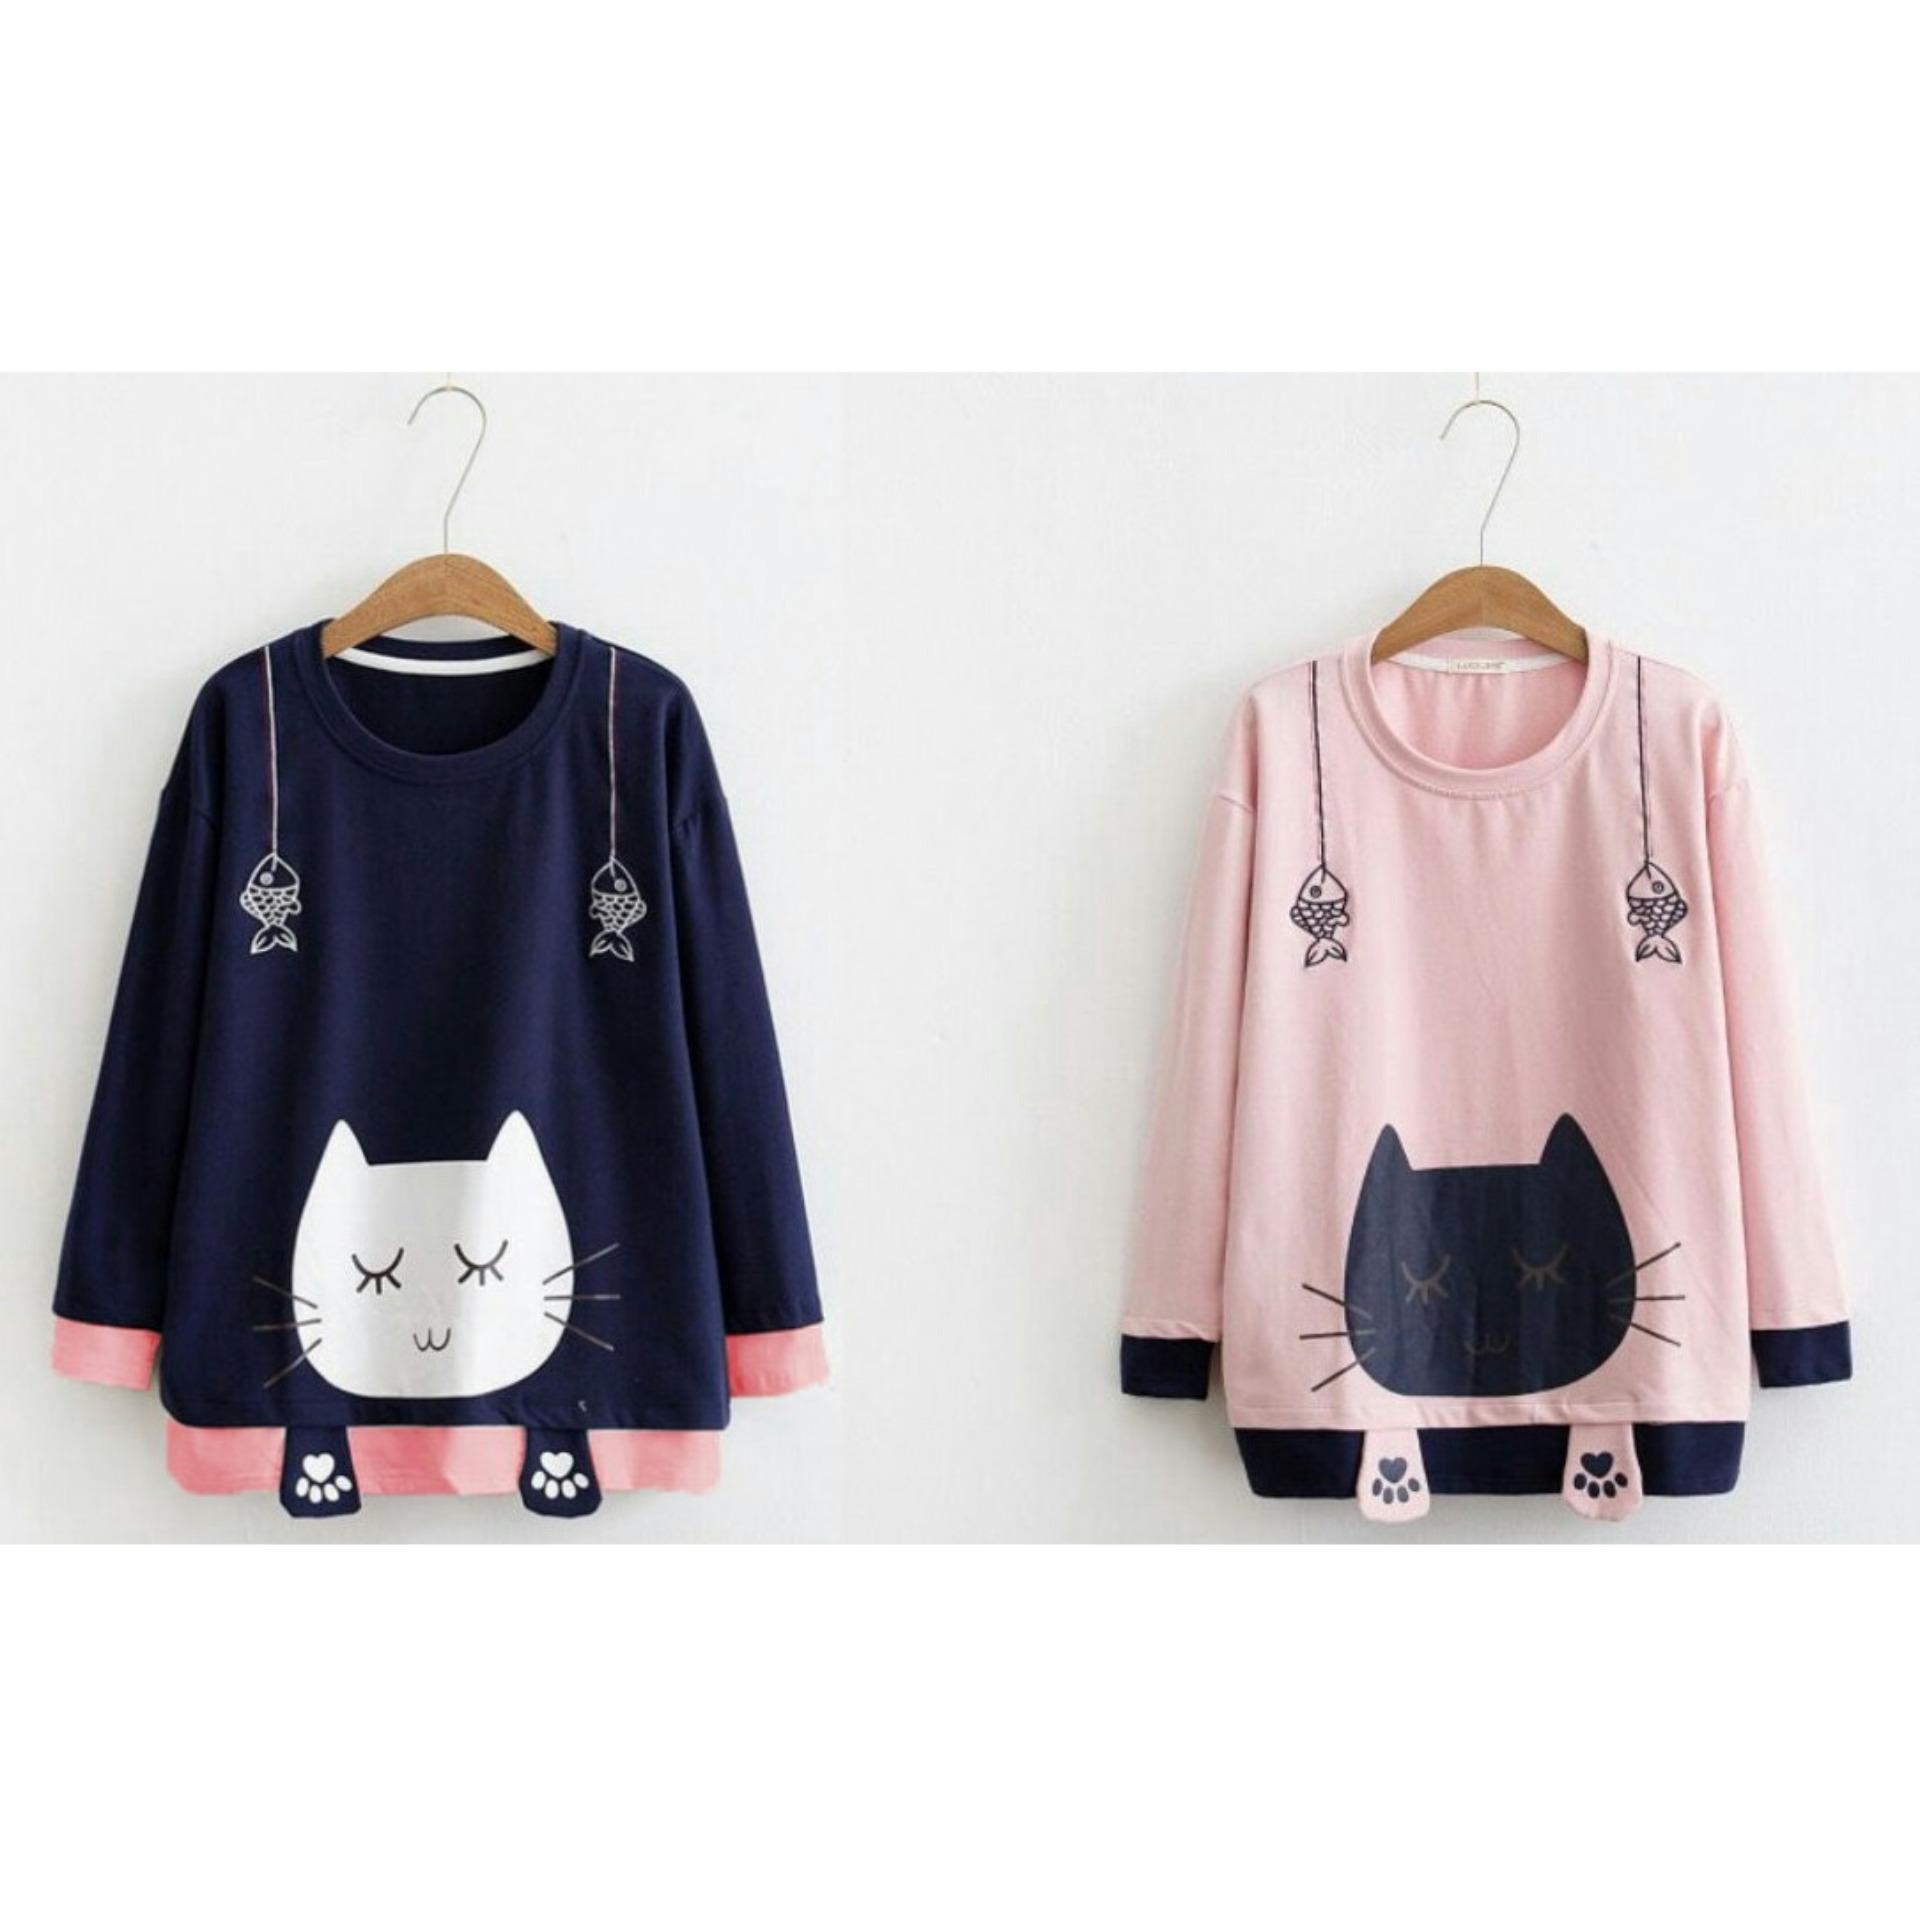 Motif kucing Suki Sweater Wanita Lengan Panjang Catty   Tumblr Tee Wanita   Sweater  Jaket 2469d5c729